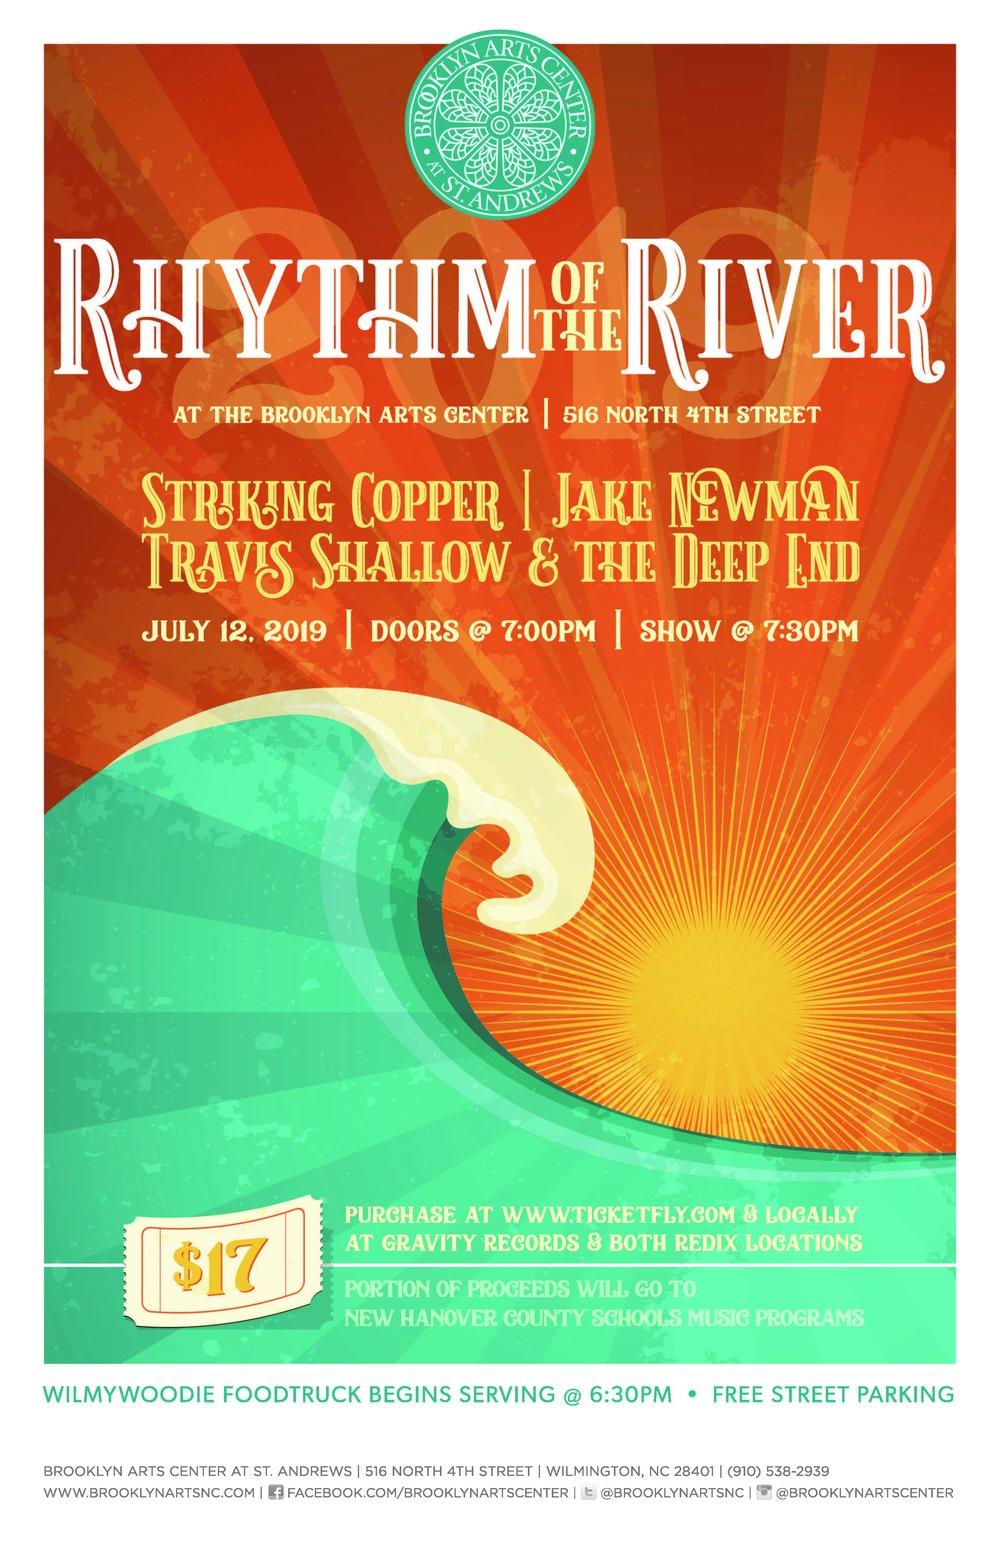 BAC-2244_Rhythm of the River 2019 poster_r4.jpg